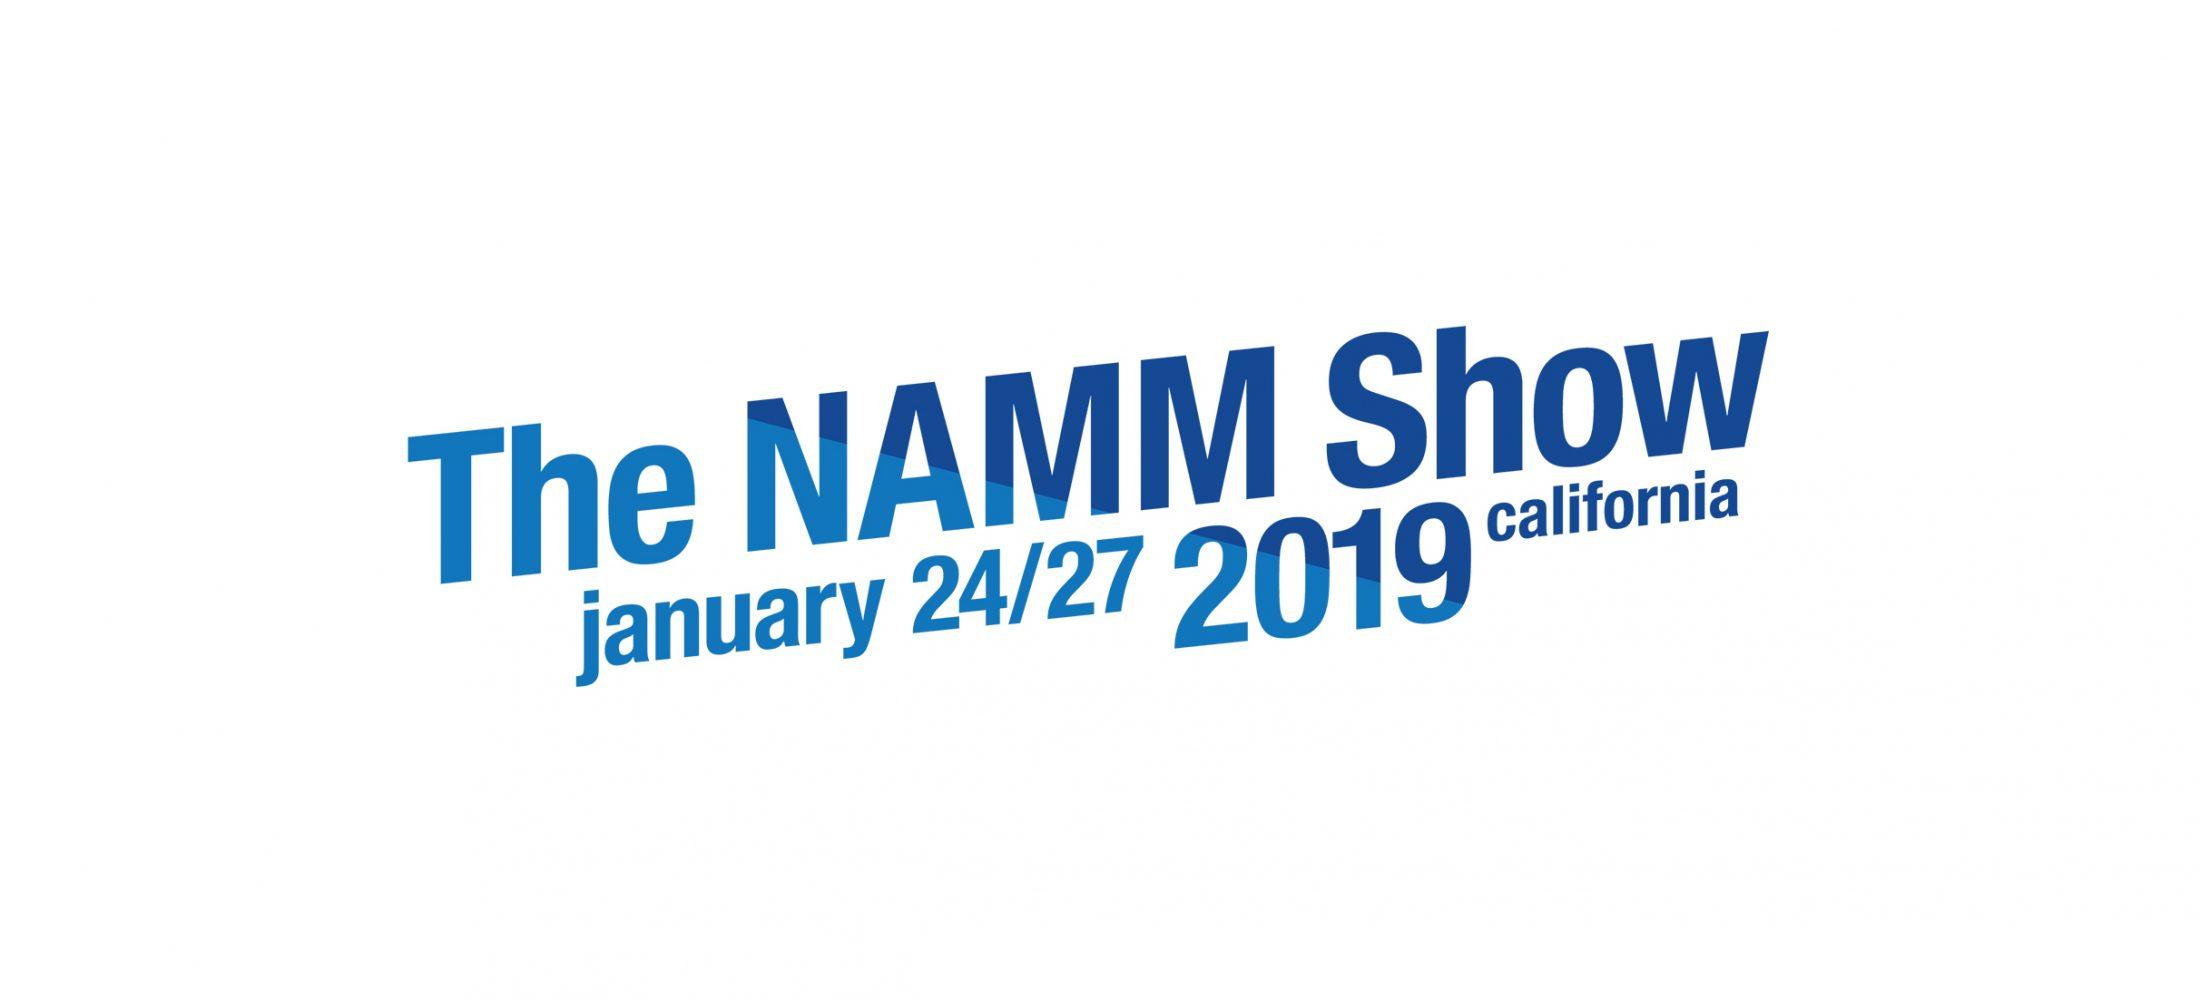 NAMM specials - 30% off store